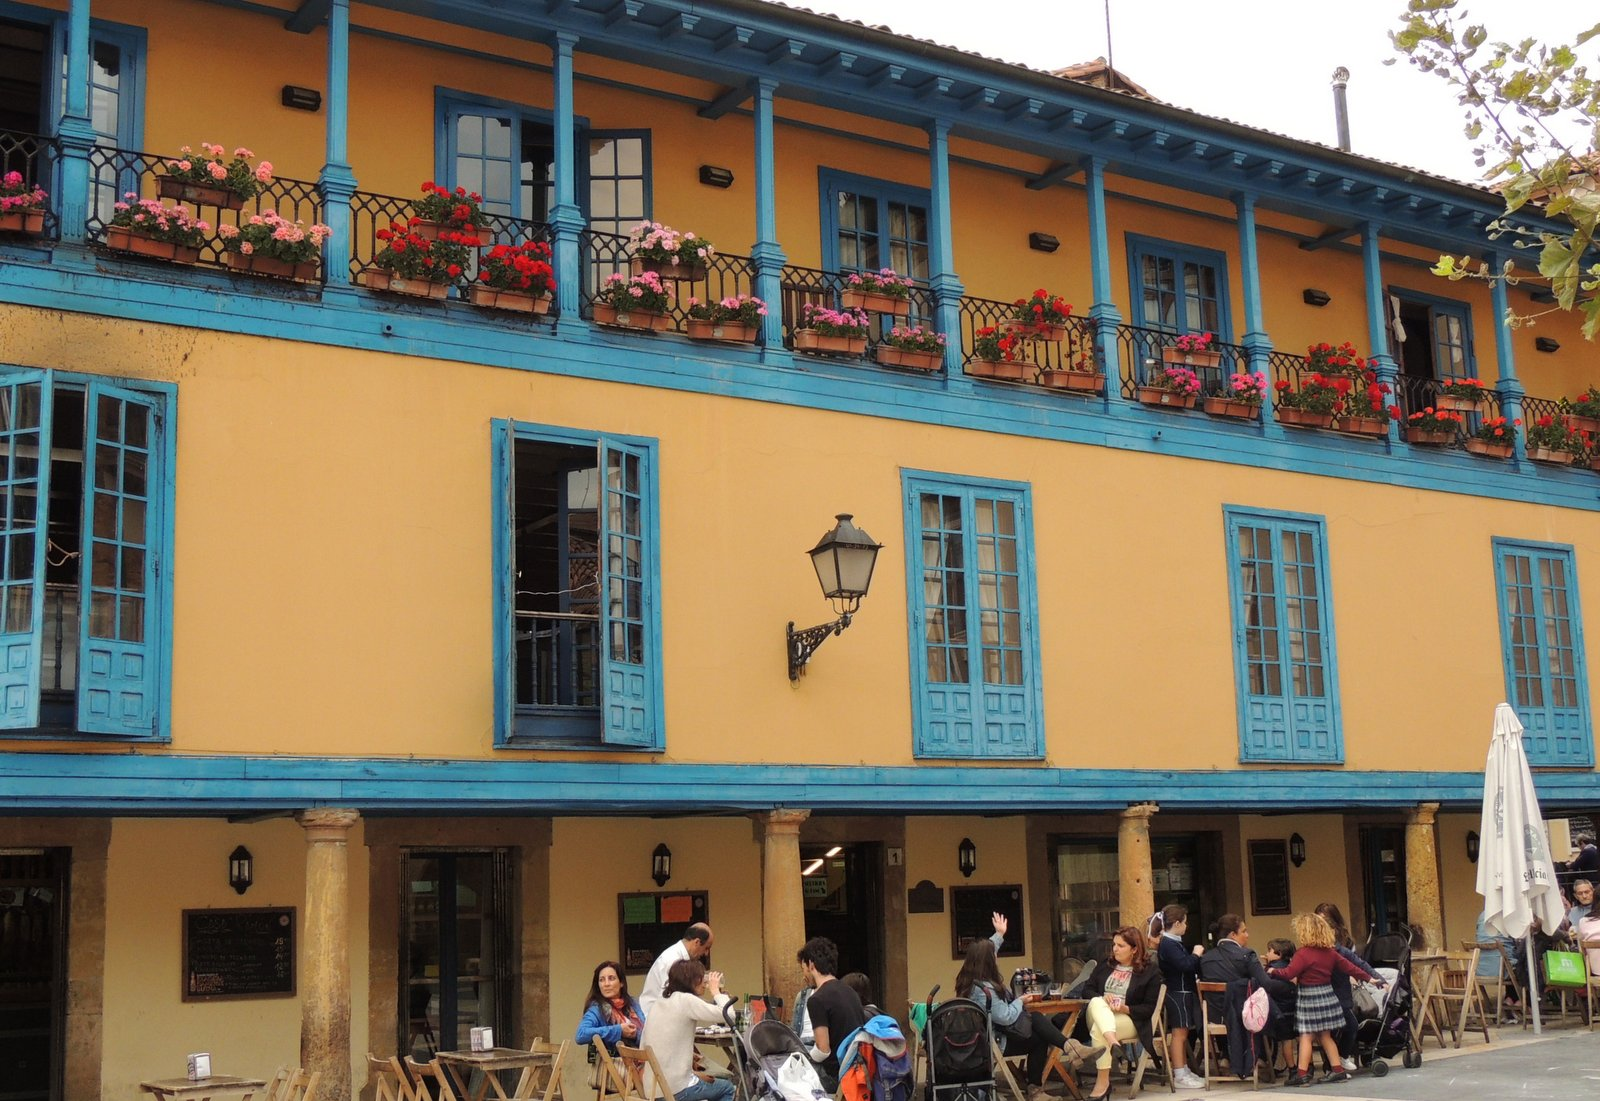 Plaza Fontan in Oviedo - Sideria